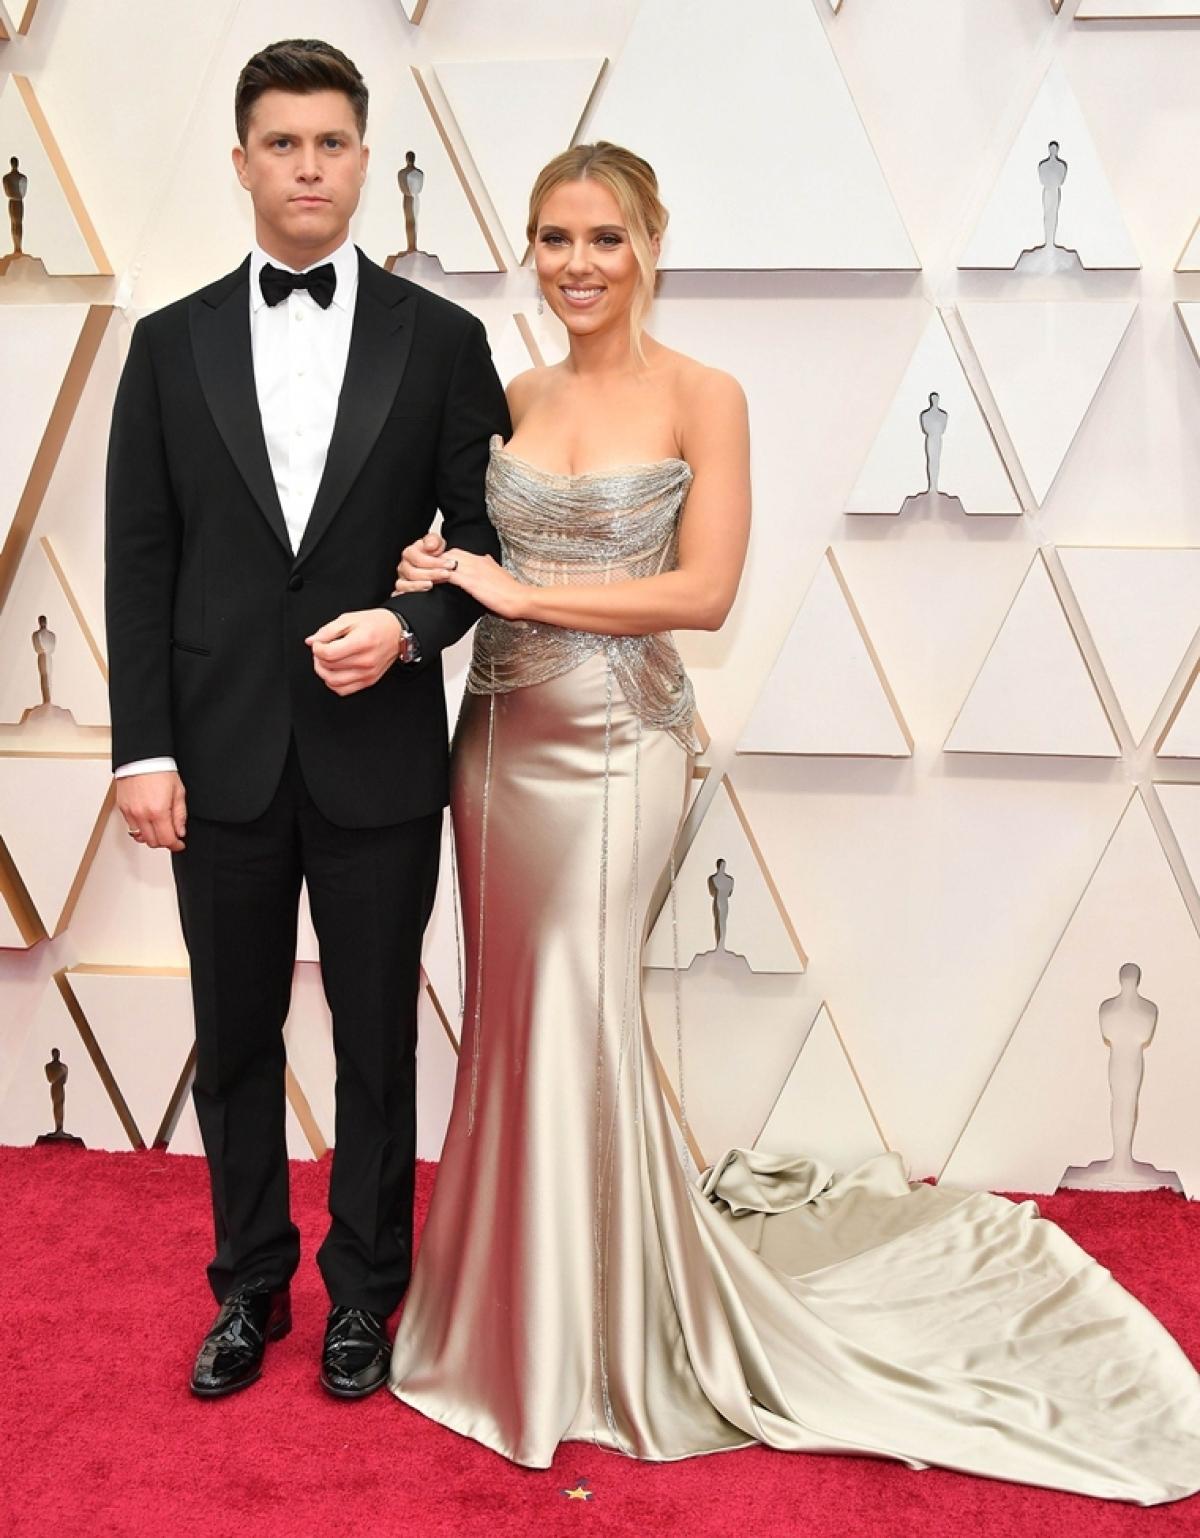 Colin Jost with Scarlett Johansson